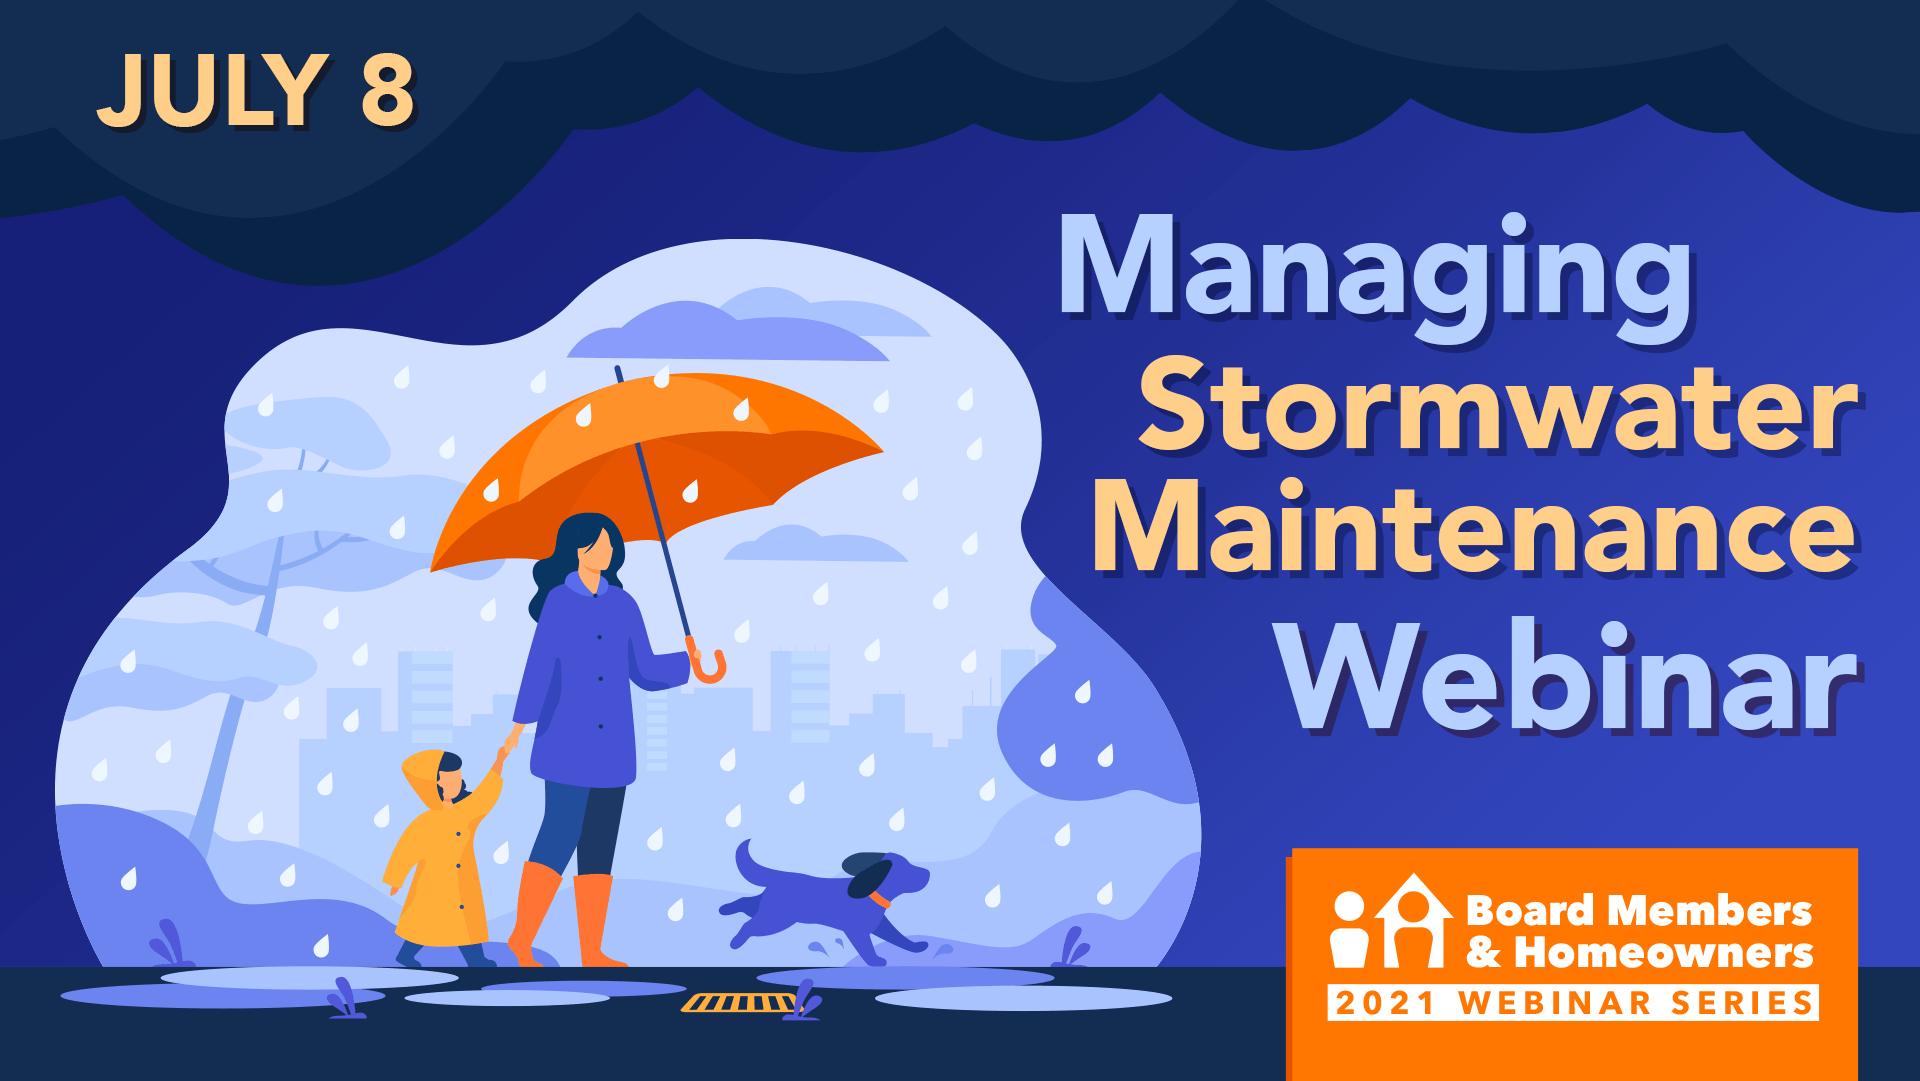 Managing Stormwater Maintenance Webinar